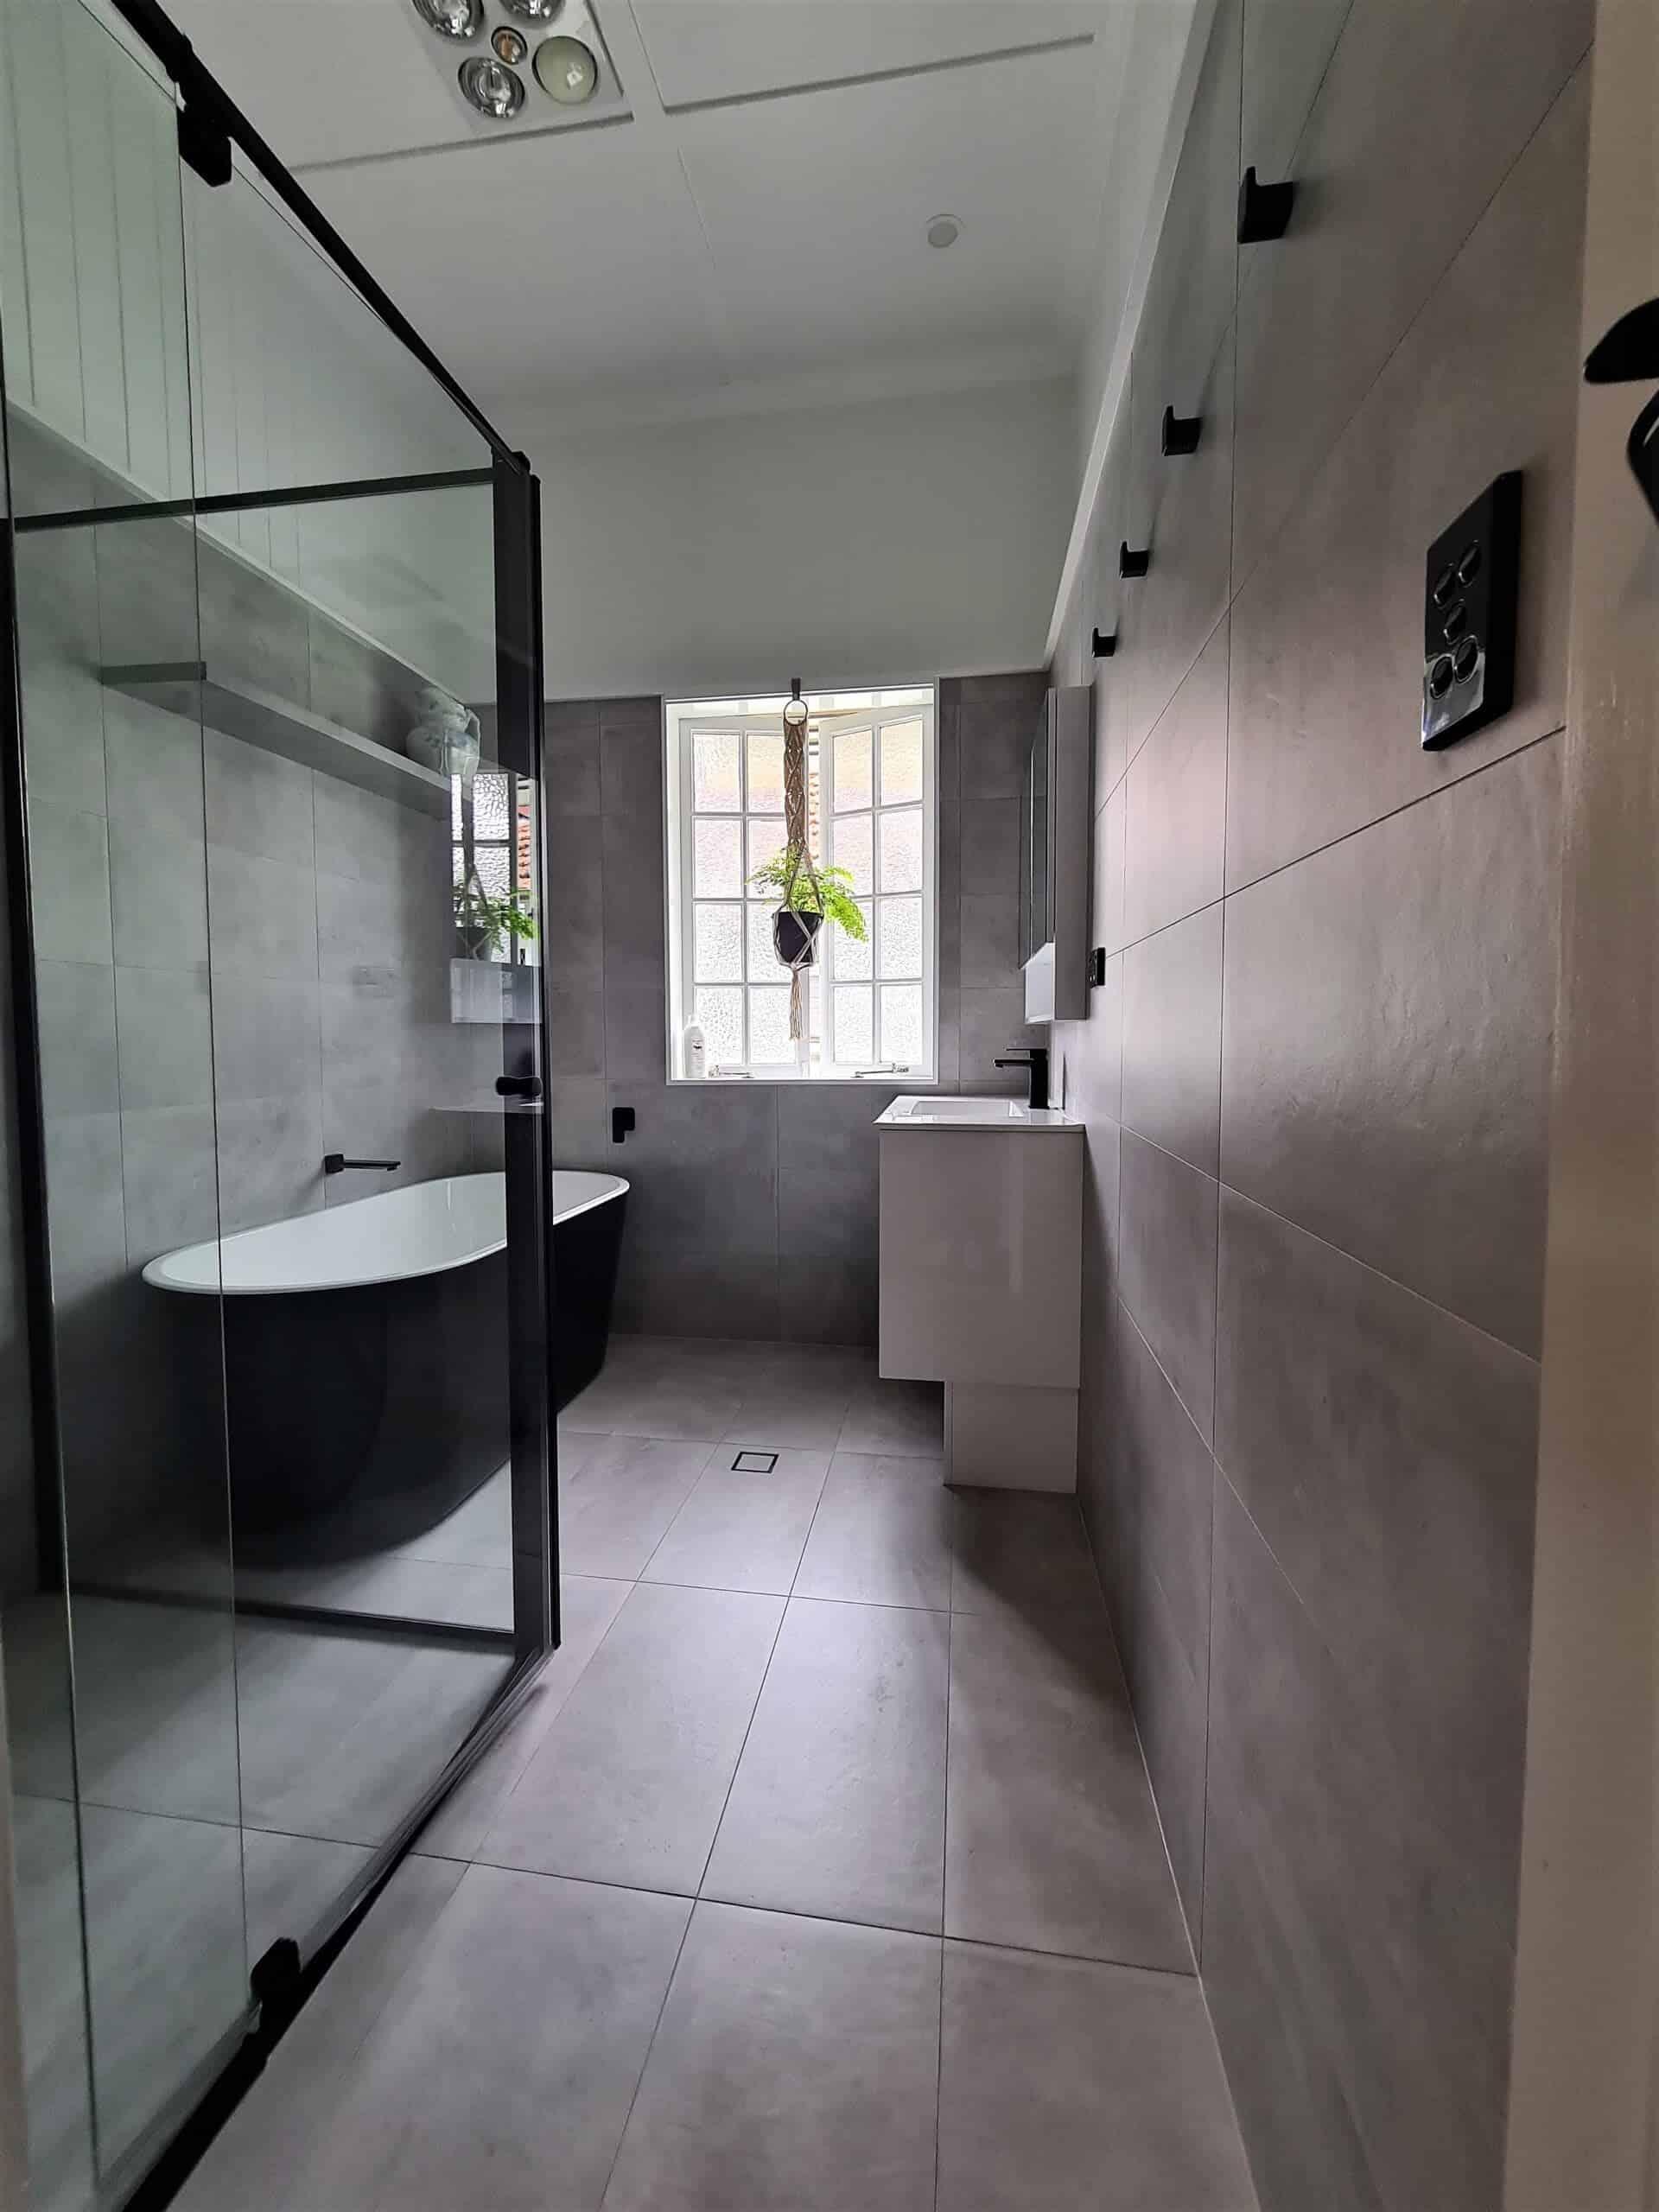 New Farm bathroom remodel